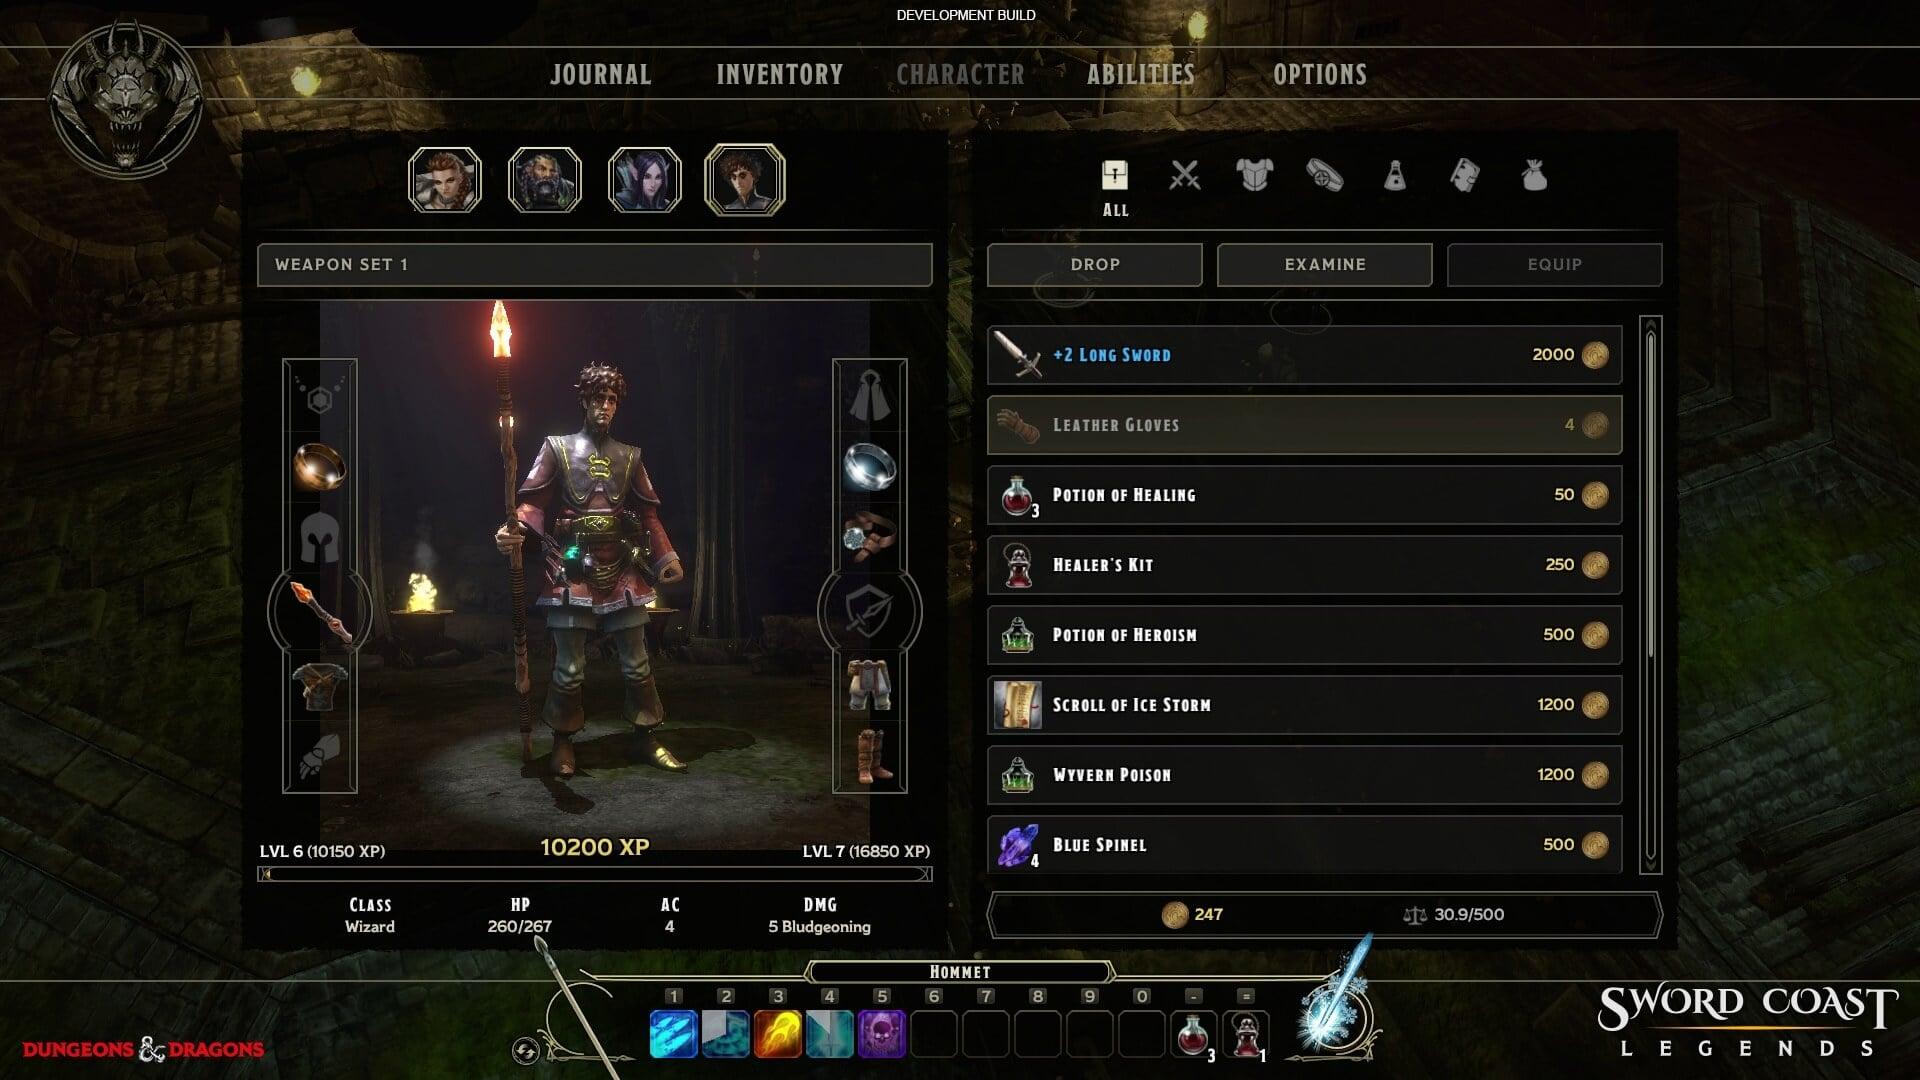 Baldurs gate: dark alliance ii cheats, codes, and secrets for